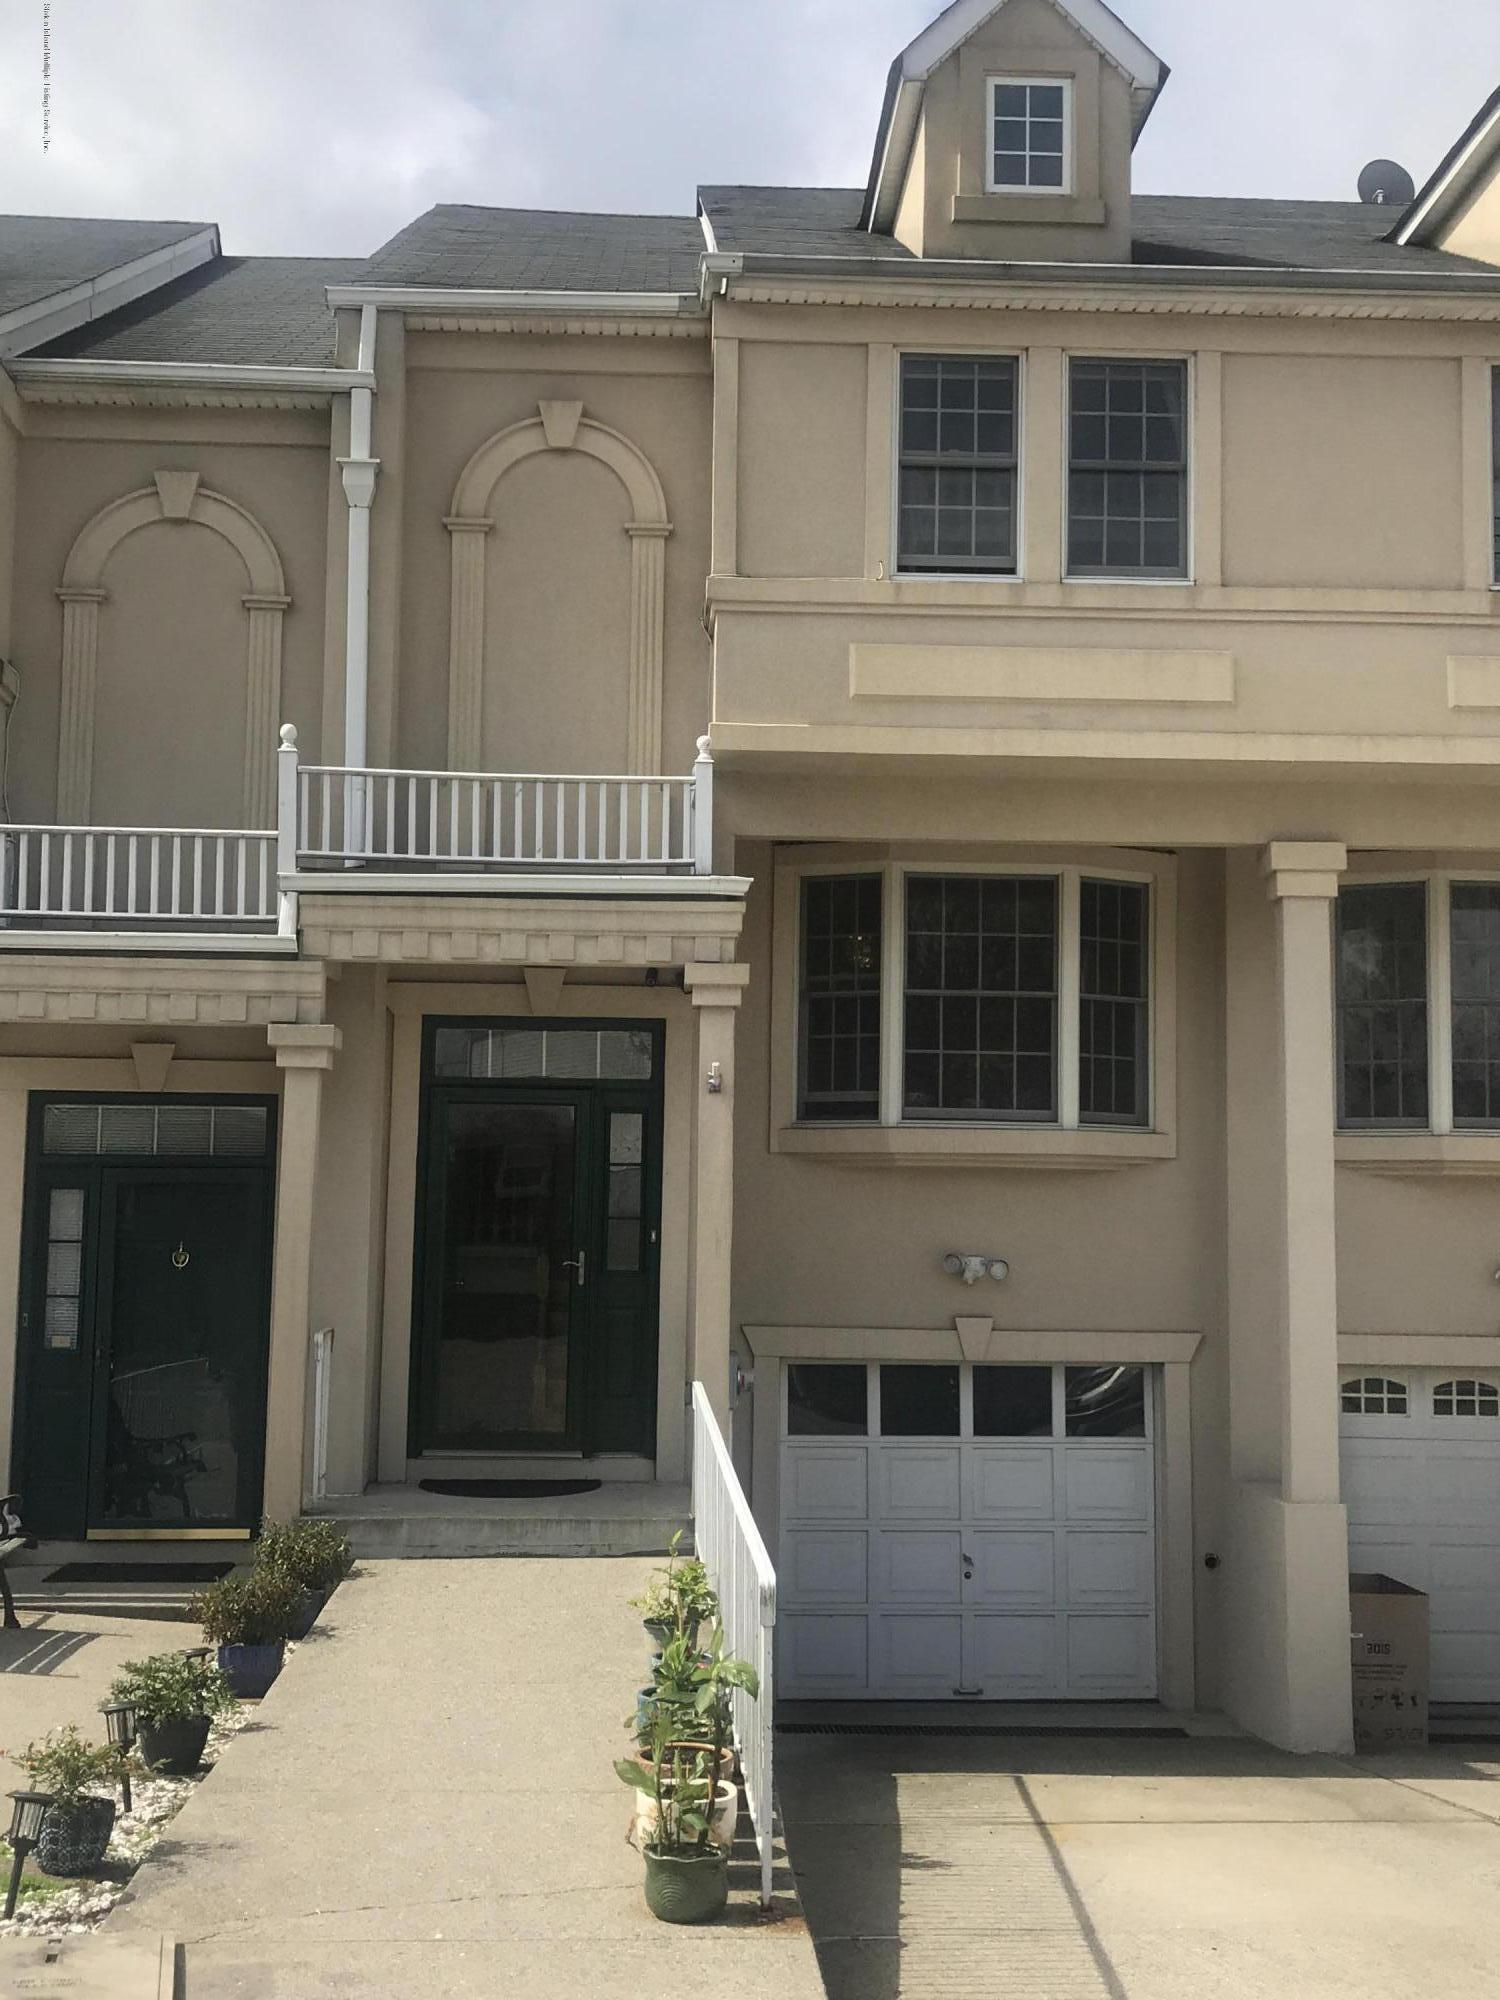 Single Family - Attached 58 Garretson Lane  Staten Island, NY 10304, MLS-1128138-2